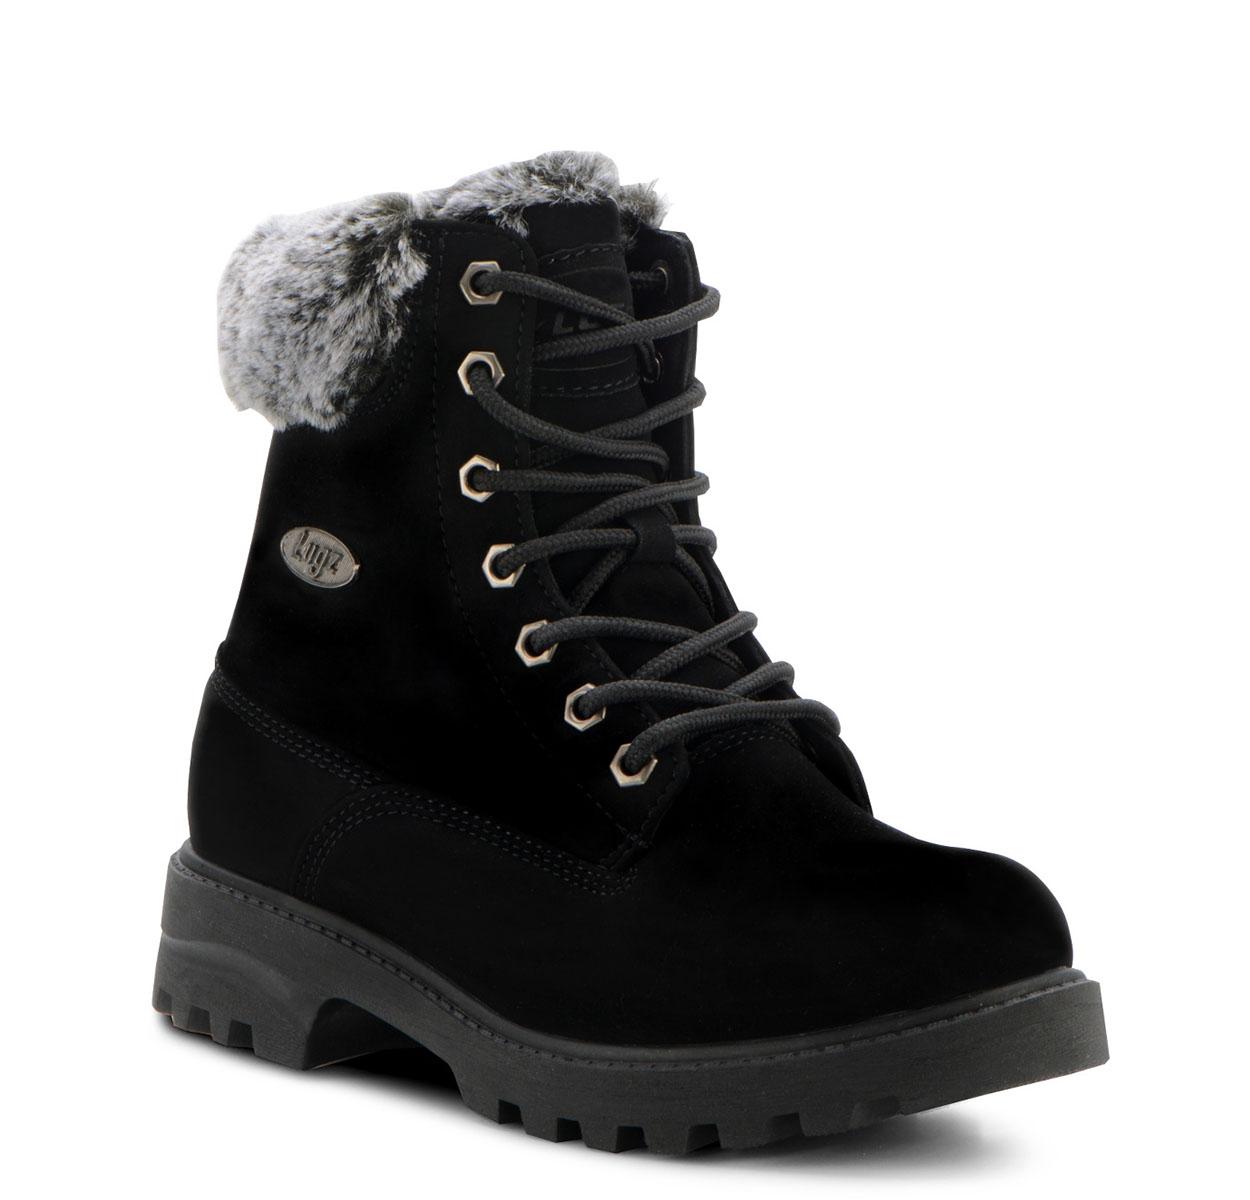 Women's Empire Hi Fur 6-Inch Boot (Choose Your Color: BLACK/BLACK-CHARCOAL, Choose Your Size: 5.5)